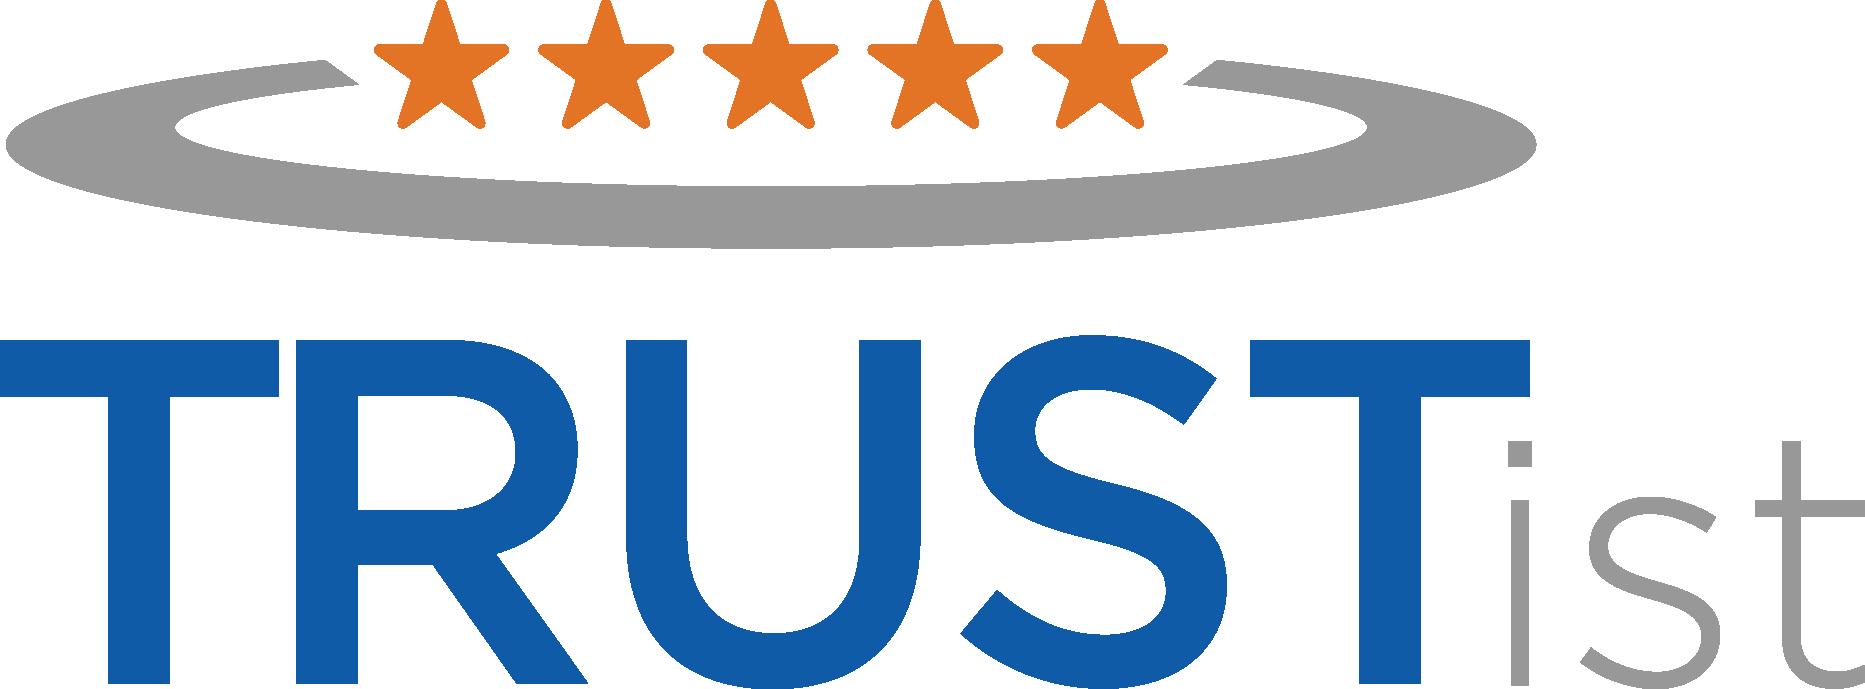 5-star-ciustomer-reviews-building-services-clapham